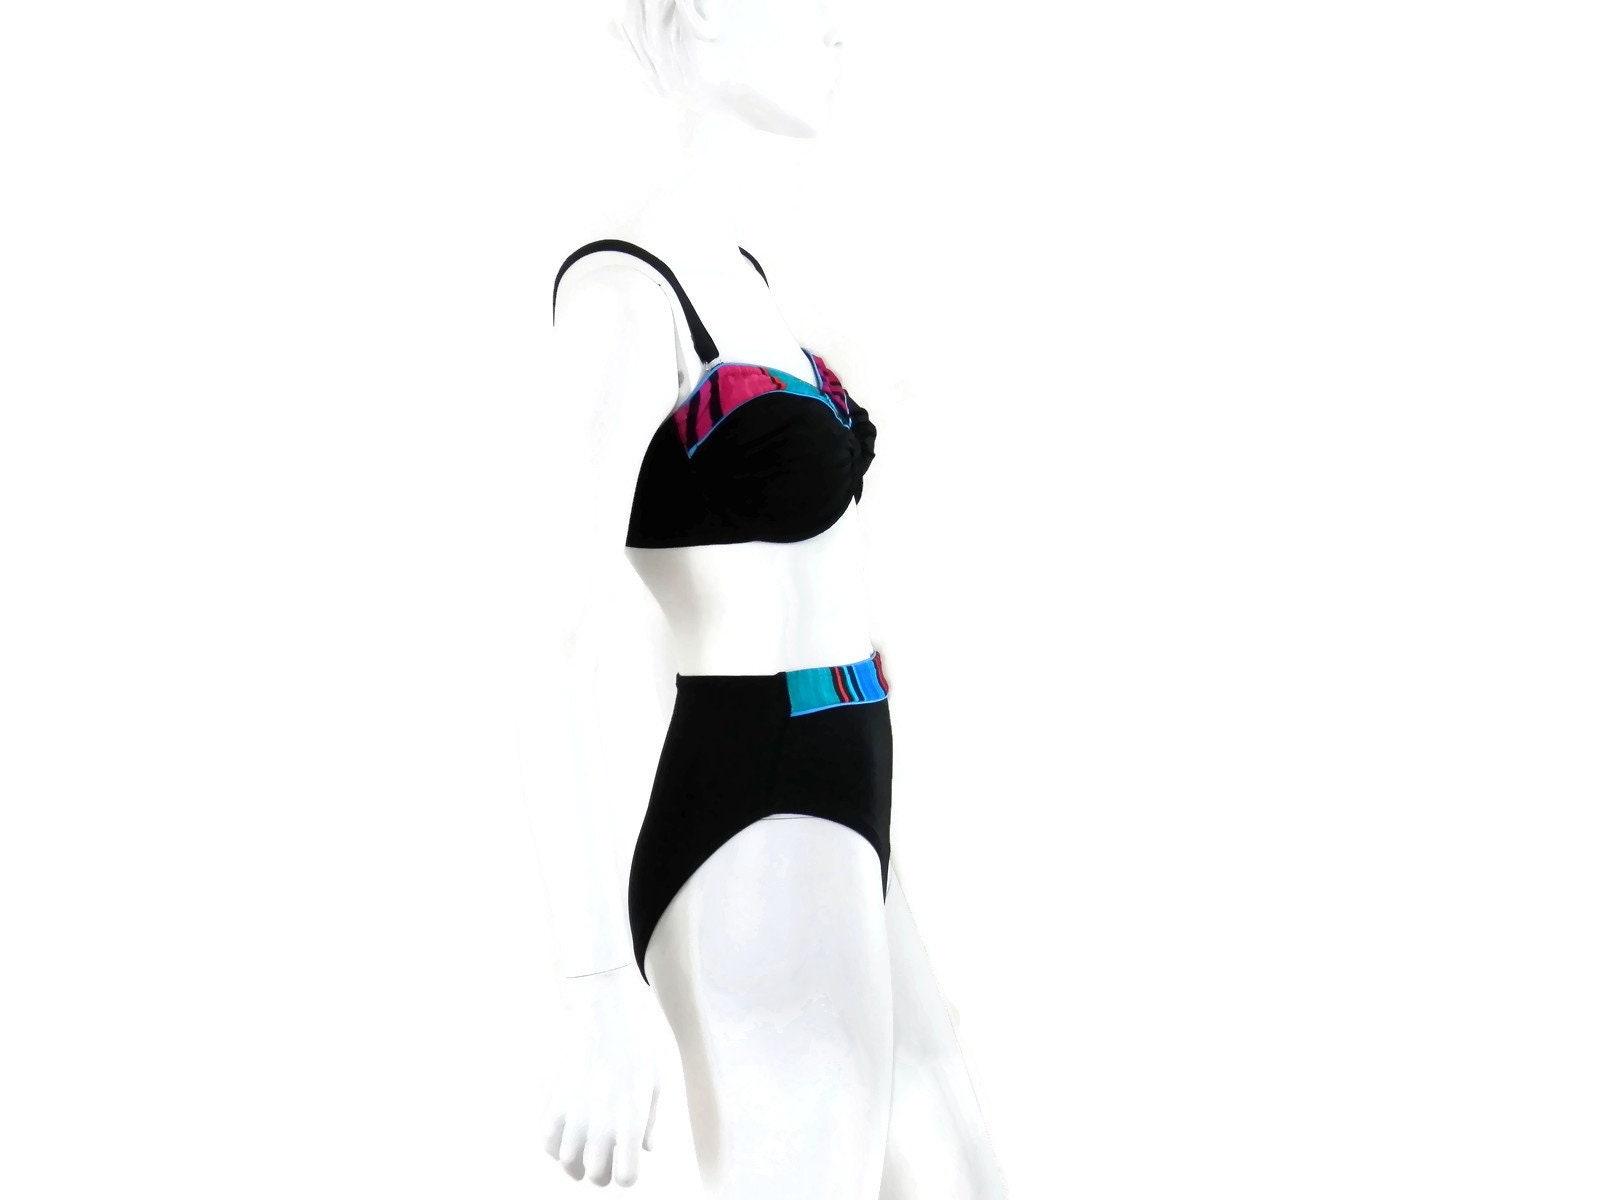 addf7c39f8c High Waist Black Bikini by Roxanne Black 2 pc Bathing Suit | Etsy